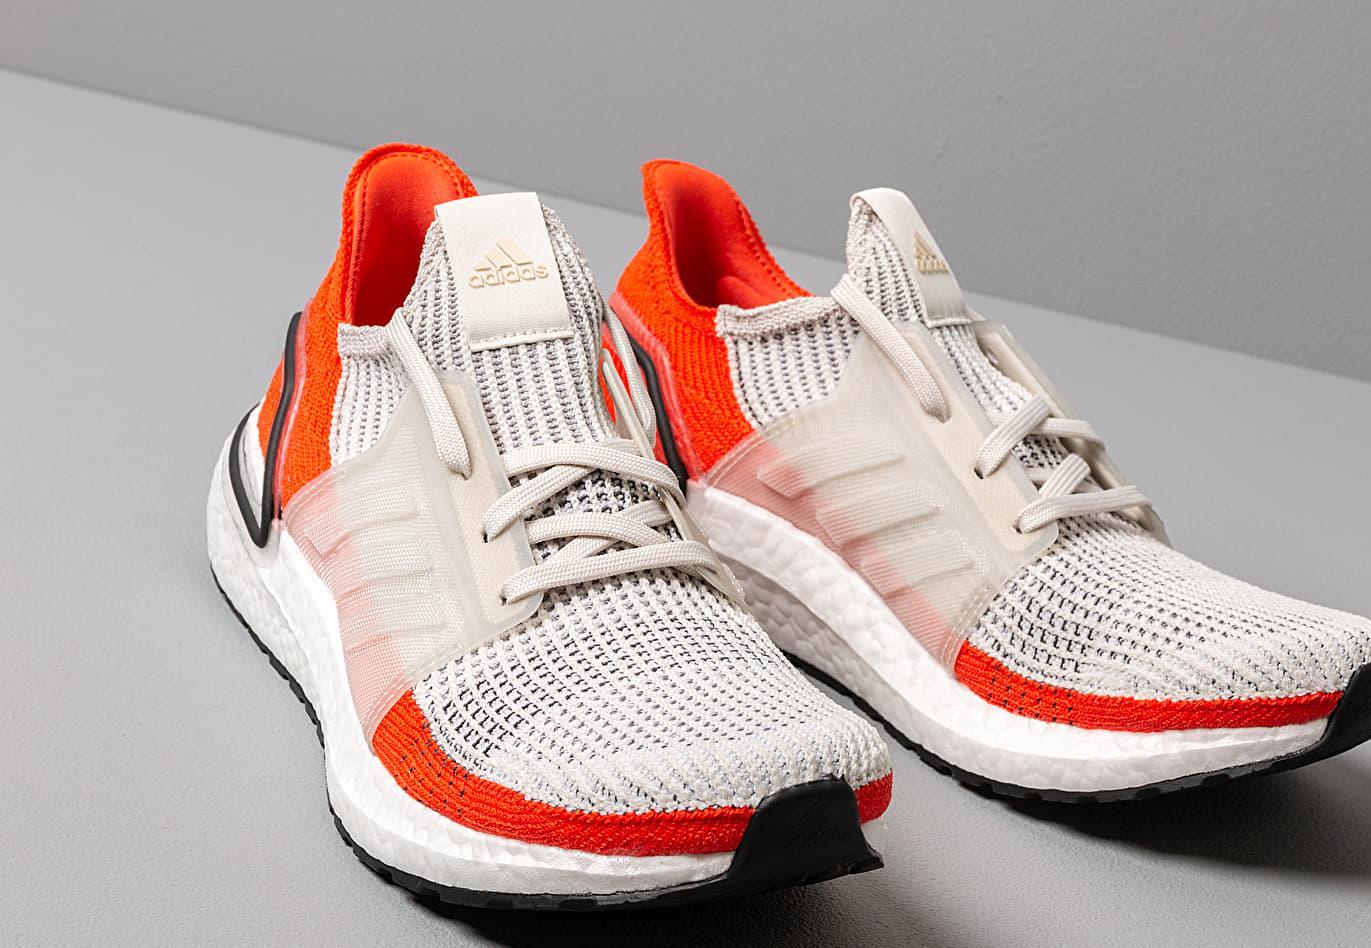 6e4bc57ba Adidas Originals - Adidas Ultraboost 19 Raw White  Ftw White  Active Orange  for Men. View fullscreen